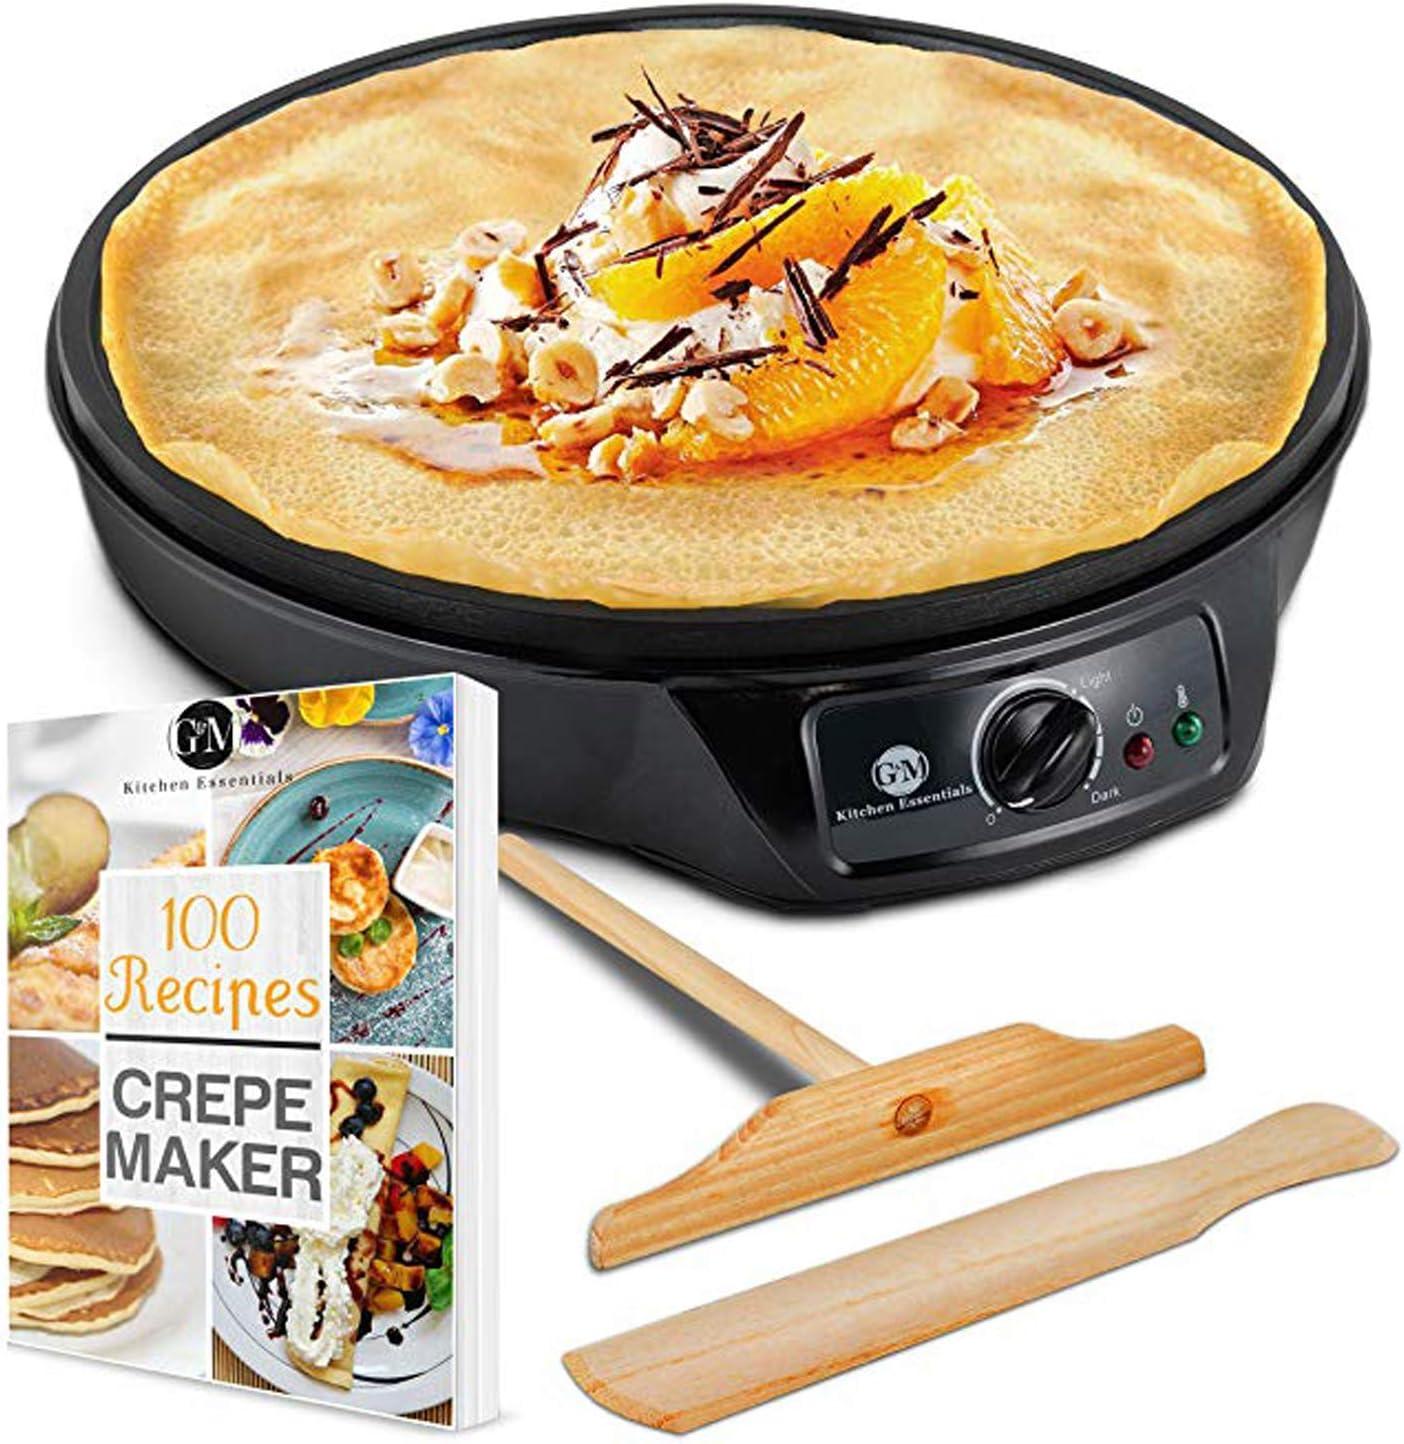 Crepe Maker Machine Pancake Griddle Nonstick 12 Electric Griddle Pancake Maker, Batter Spreader, Wooden Spatula Crepe Pan for Roti, Tortilla, Blintzes Portable, Compact, Easy Clean